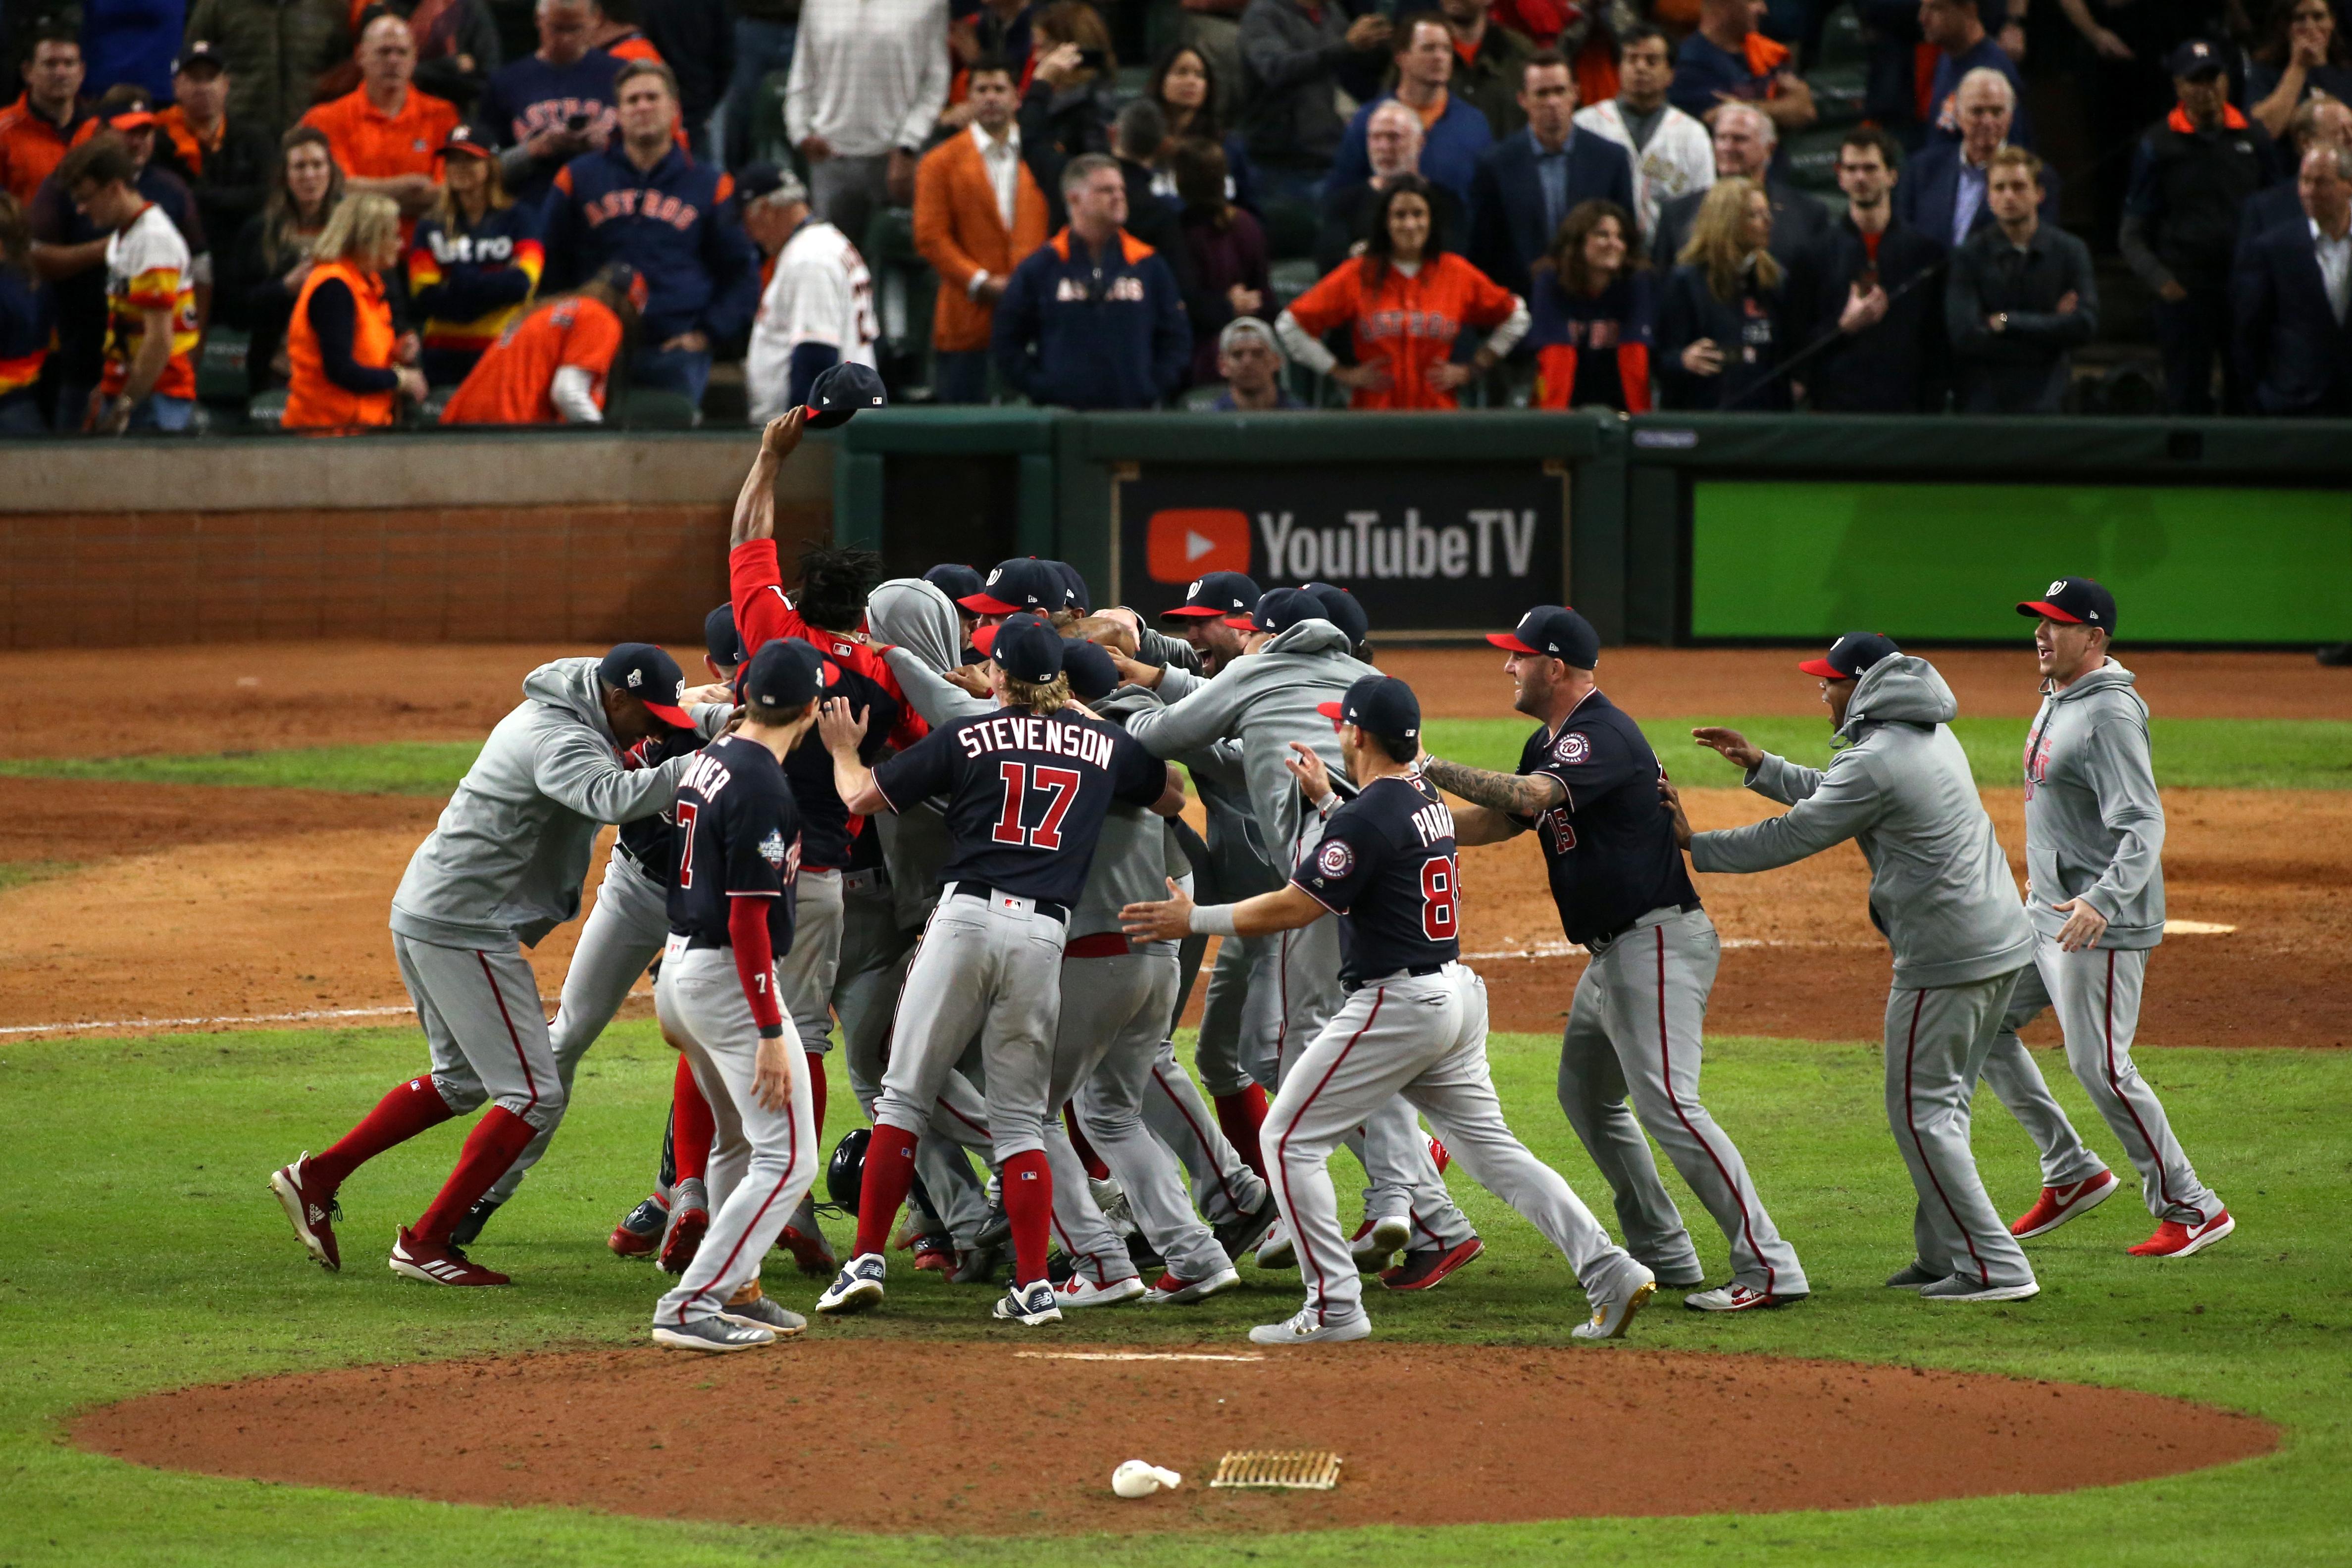 2019 World Series Game 7 - Washington Nationals v. Houston Astros